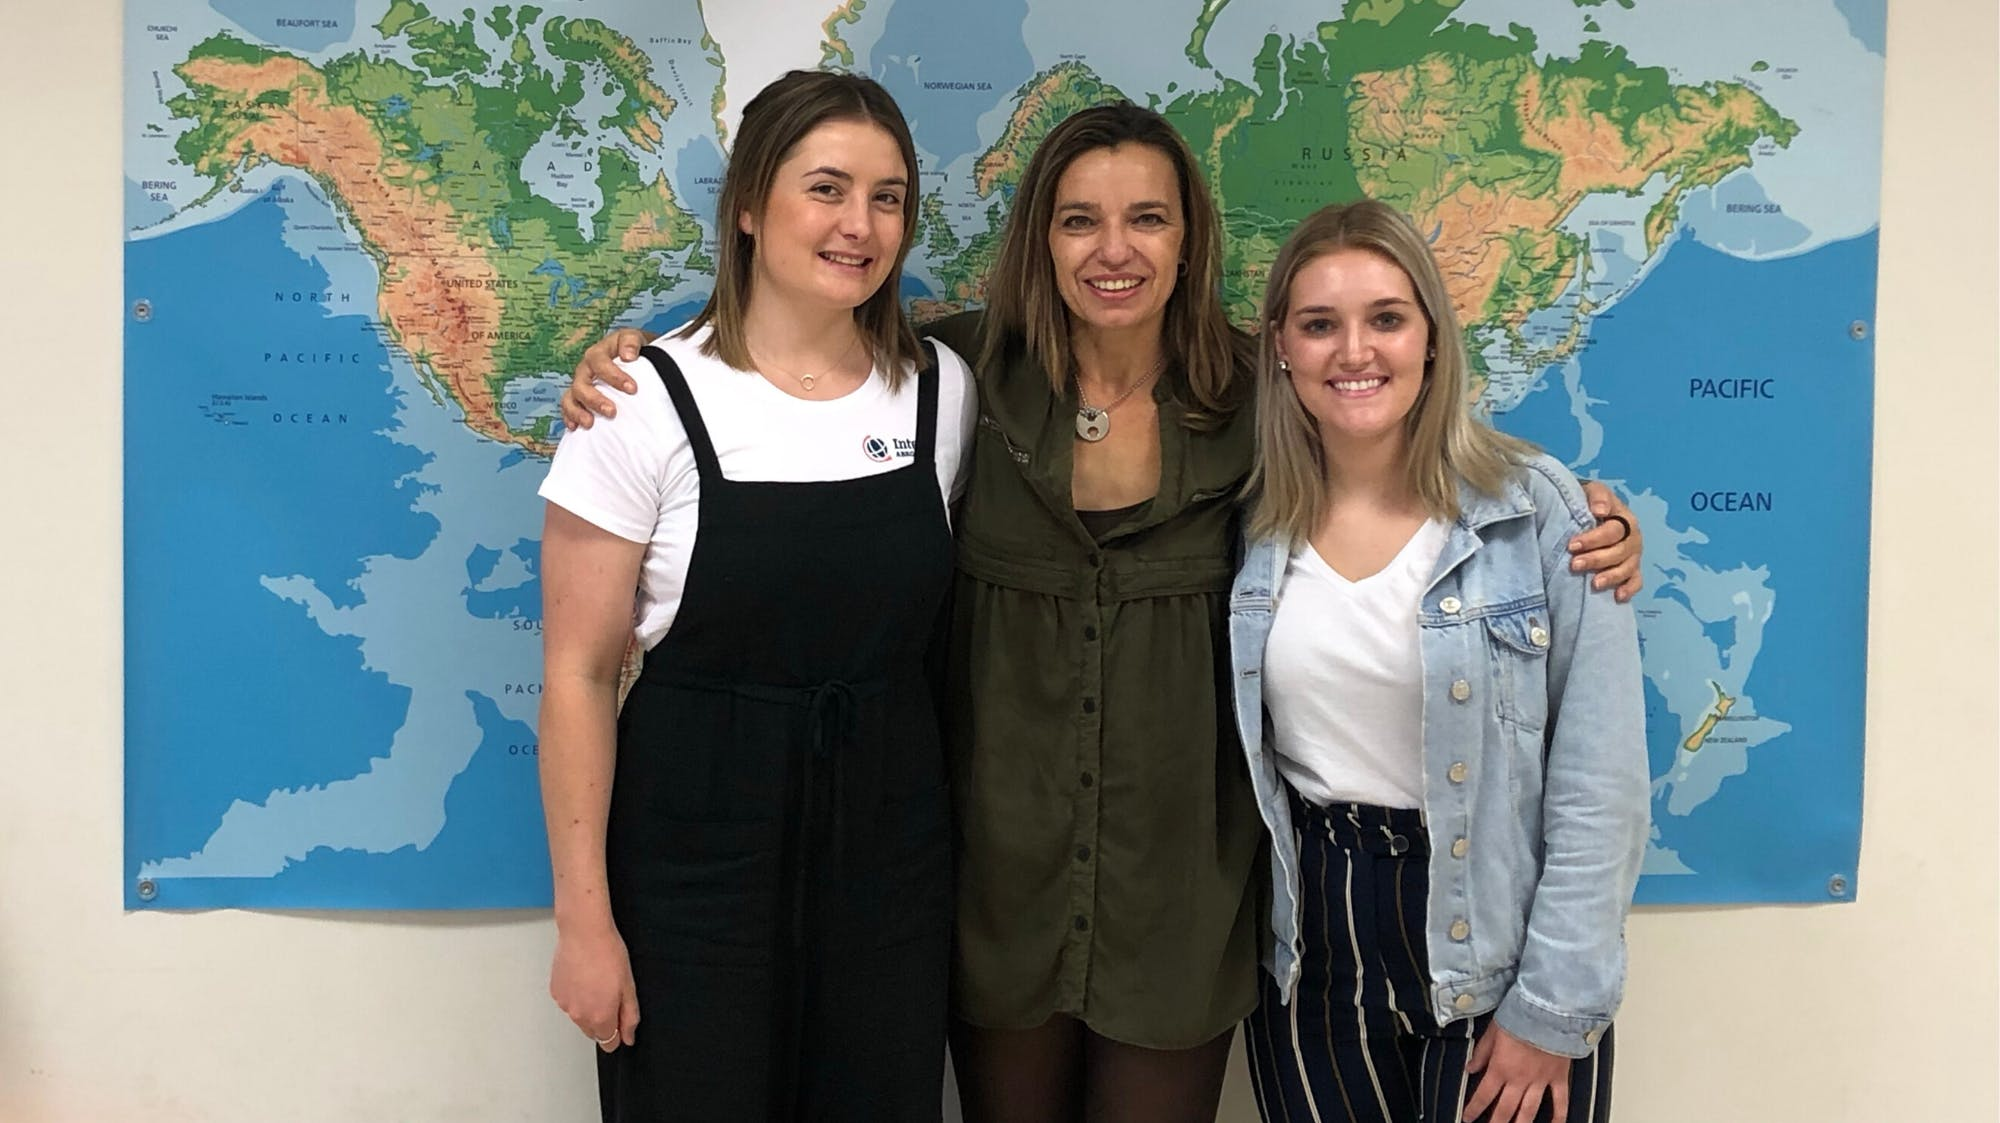 Youth Development & Education Internships abroad